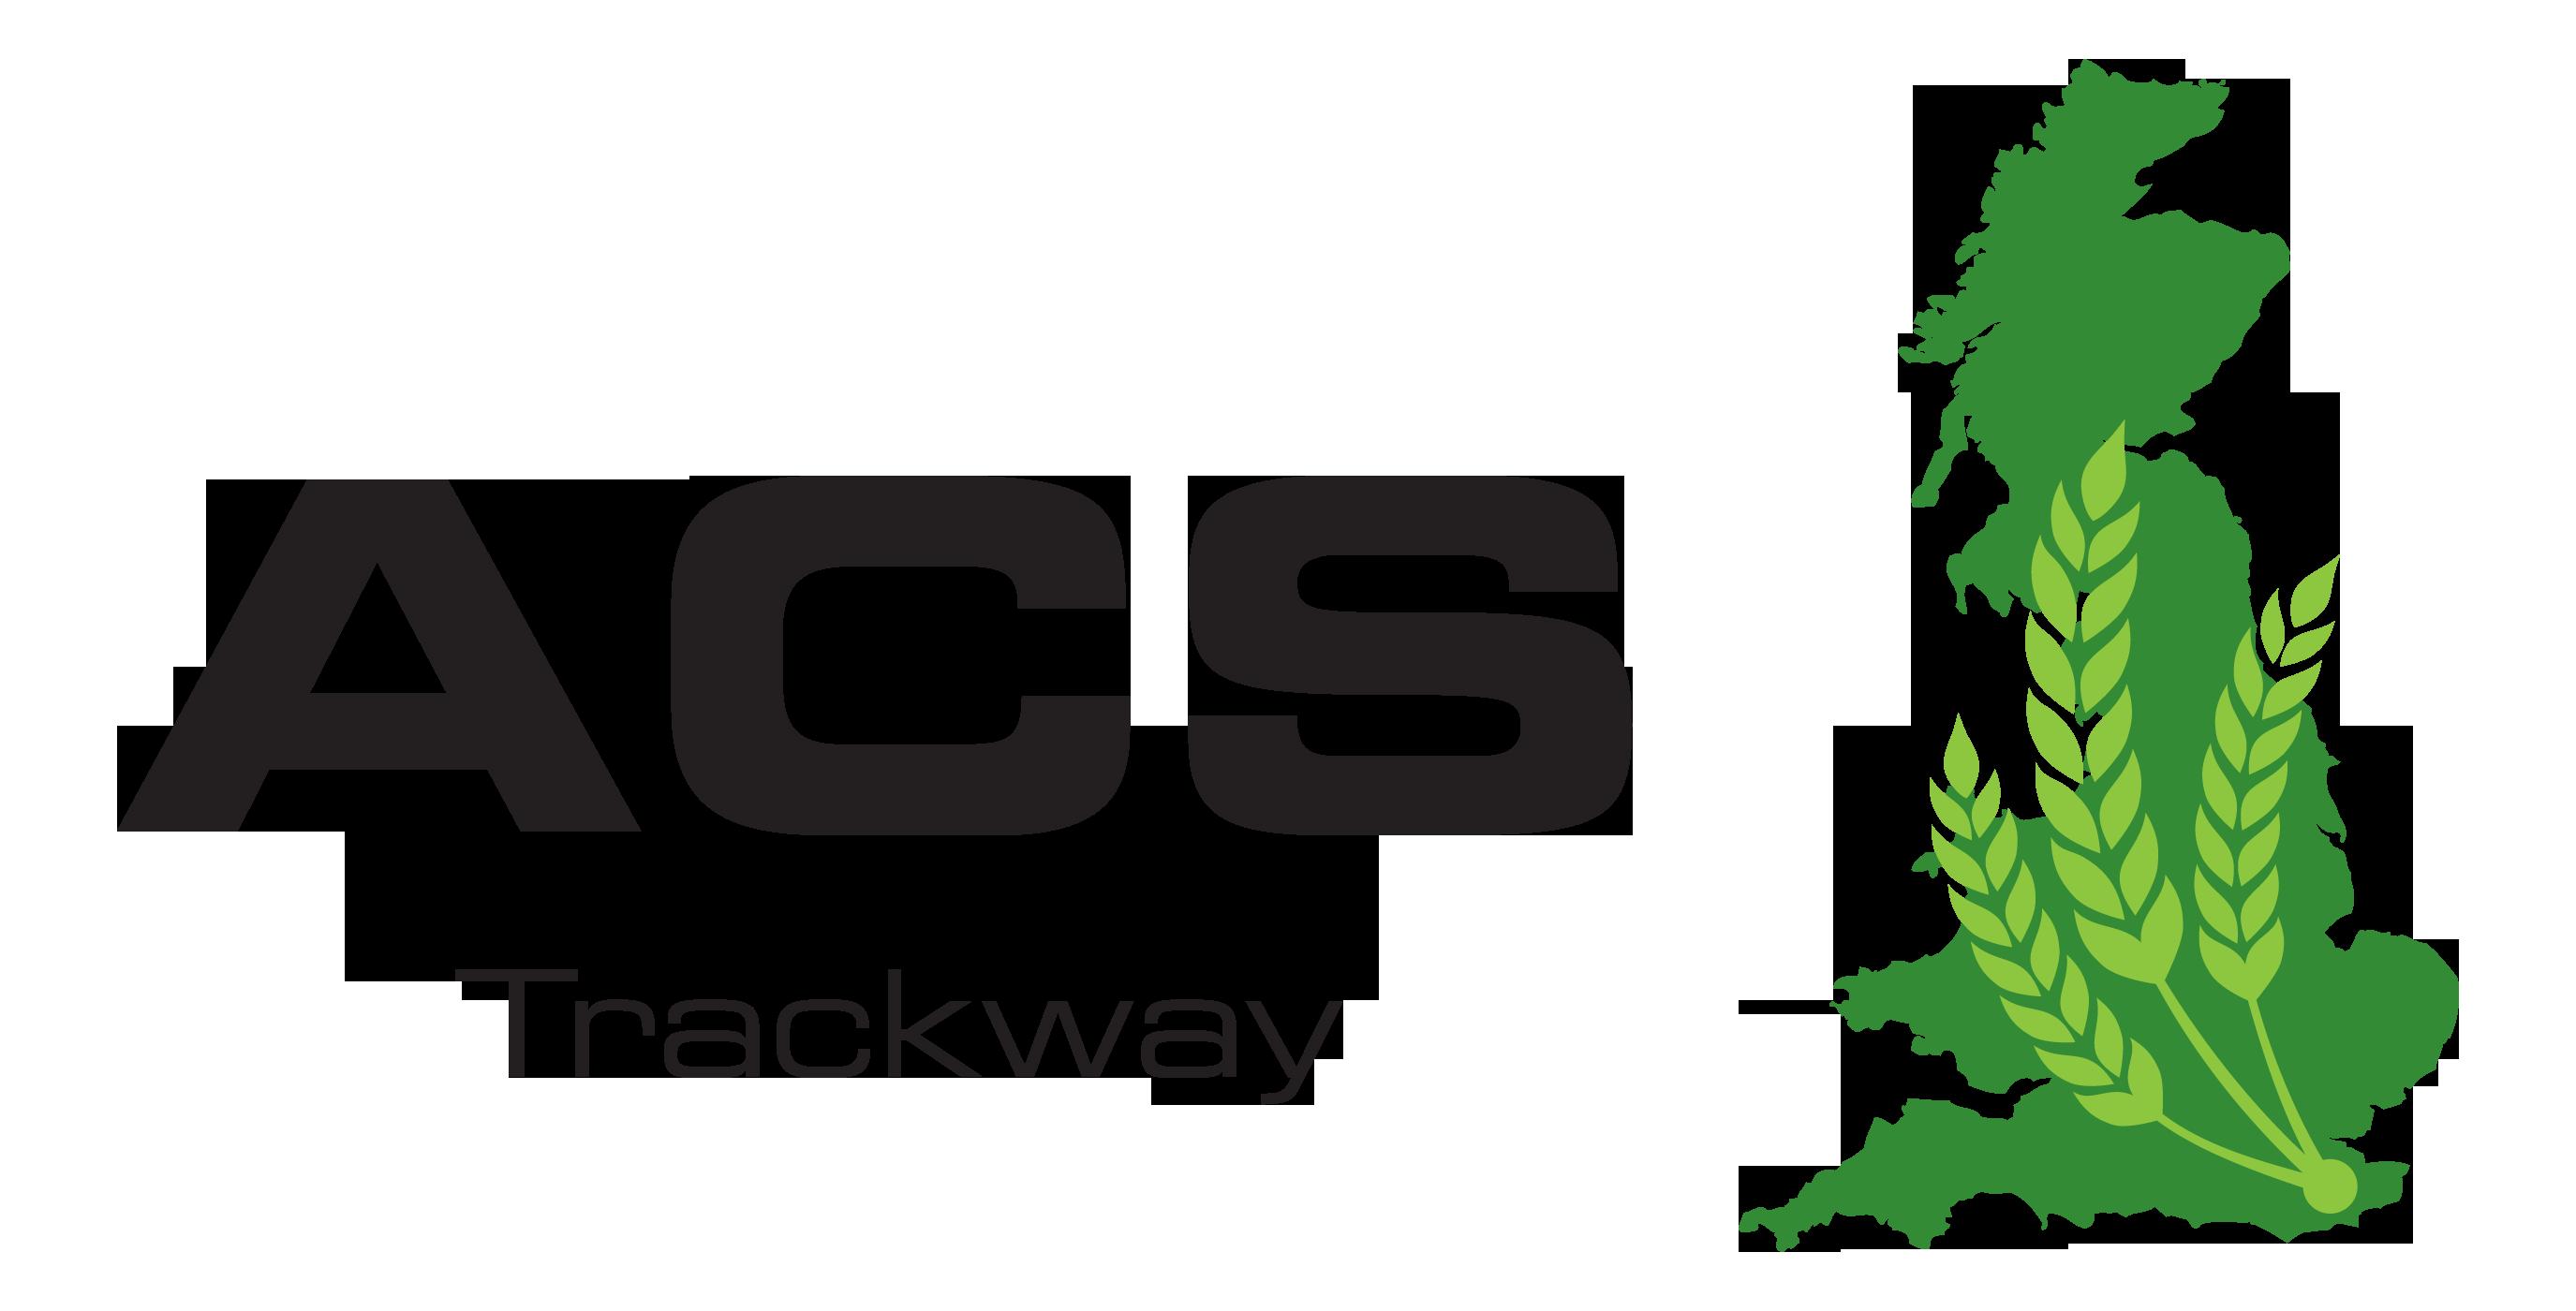 ACS Trackway